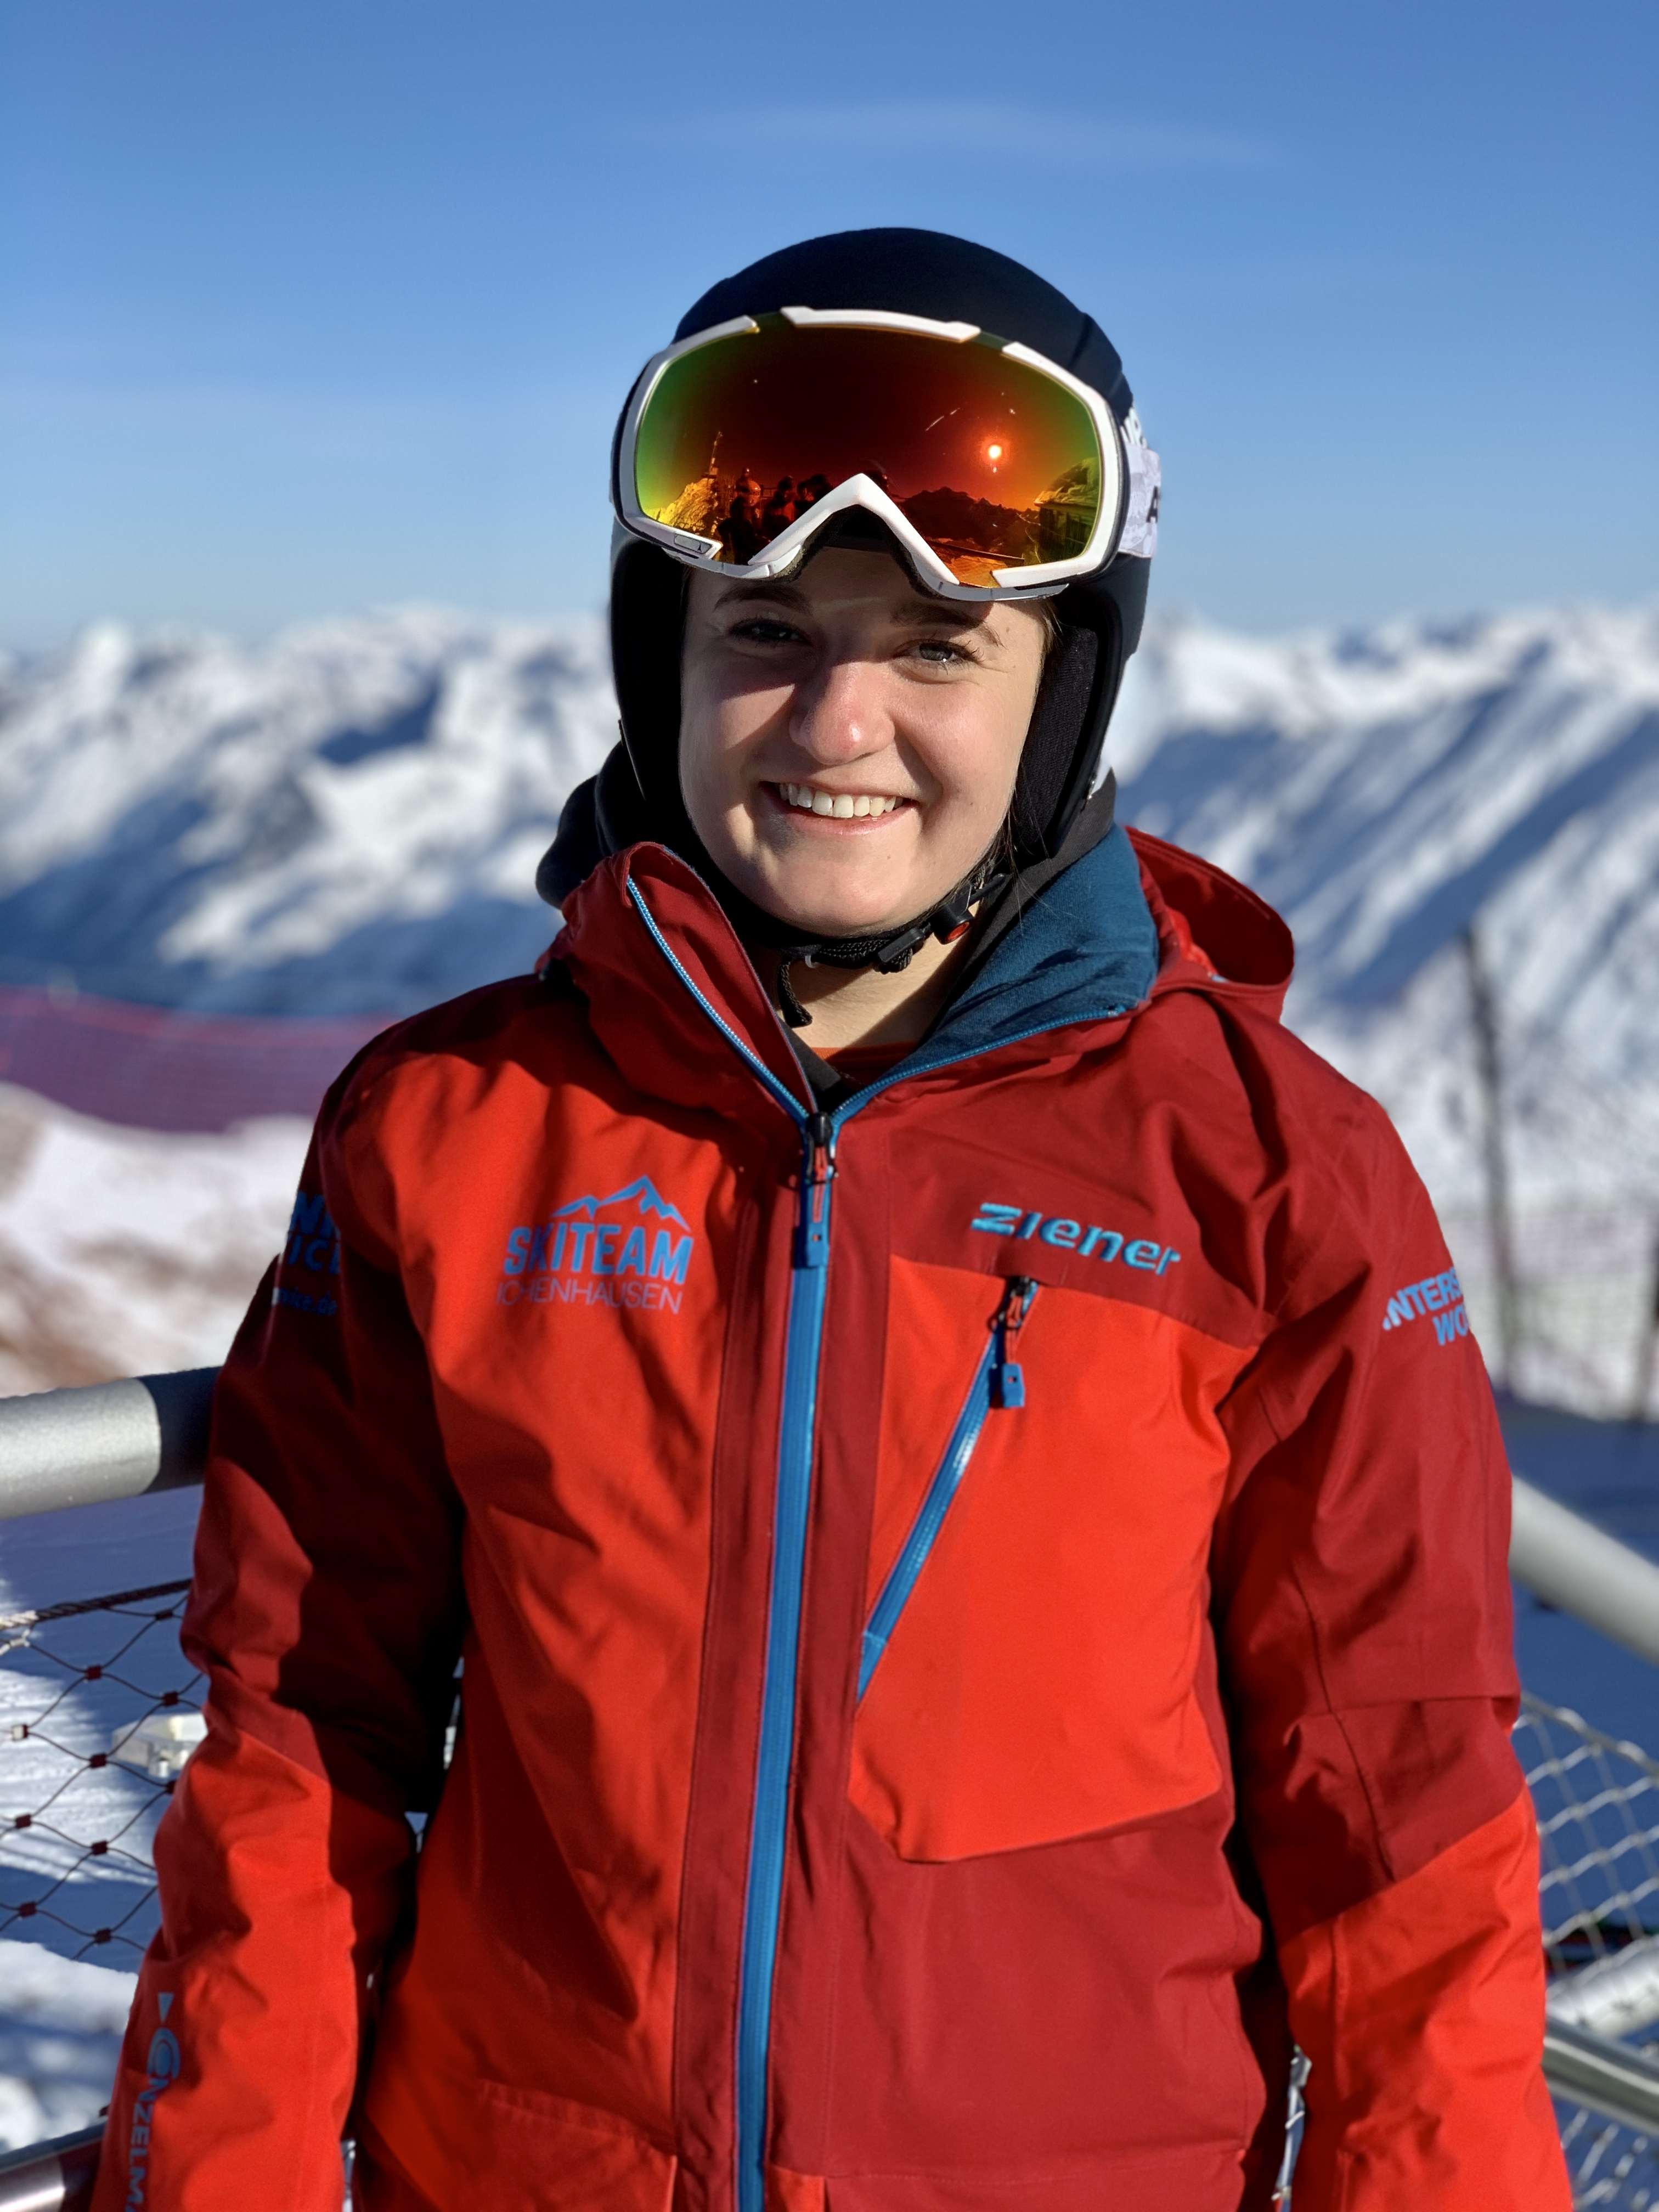 Lena Riggenmann